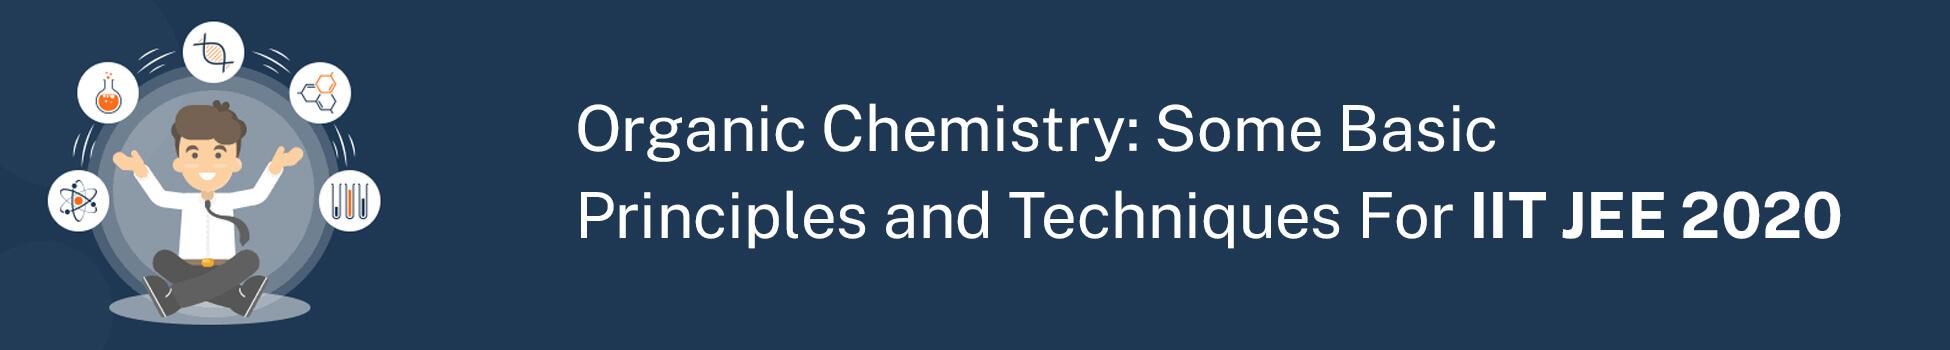 https://www.study24x7.com/article/279/organic-chemist...